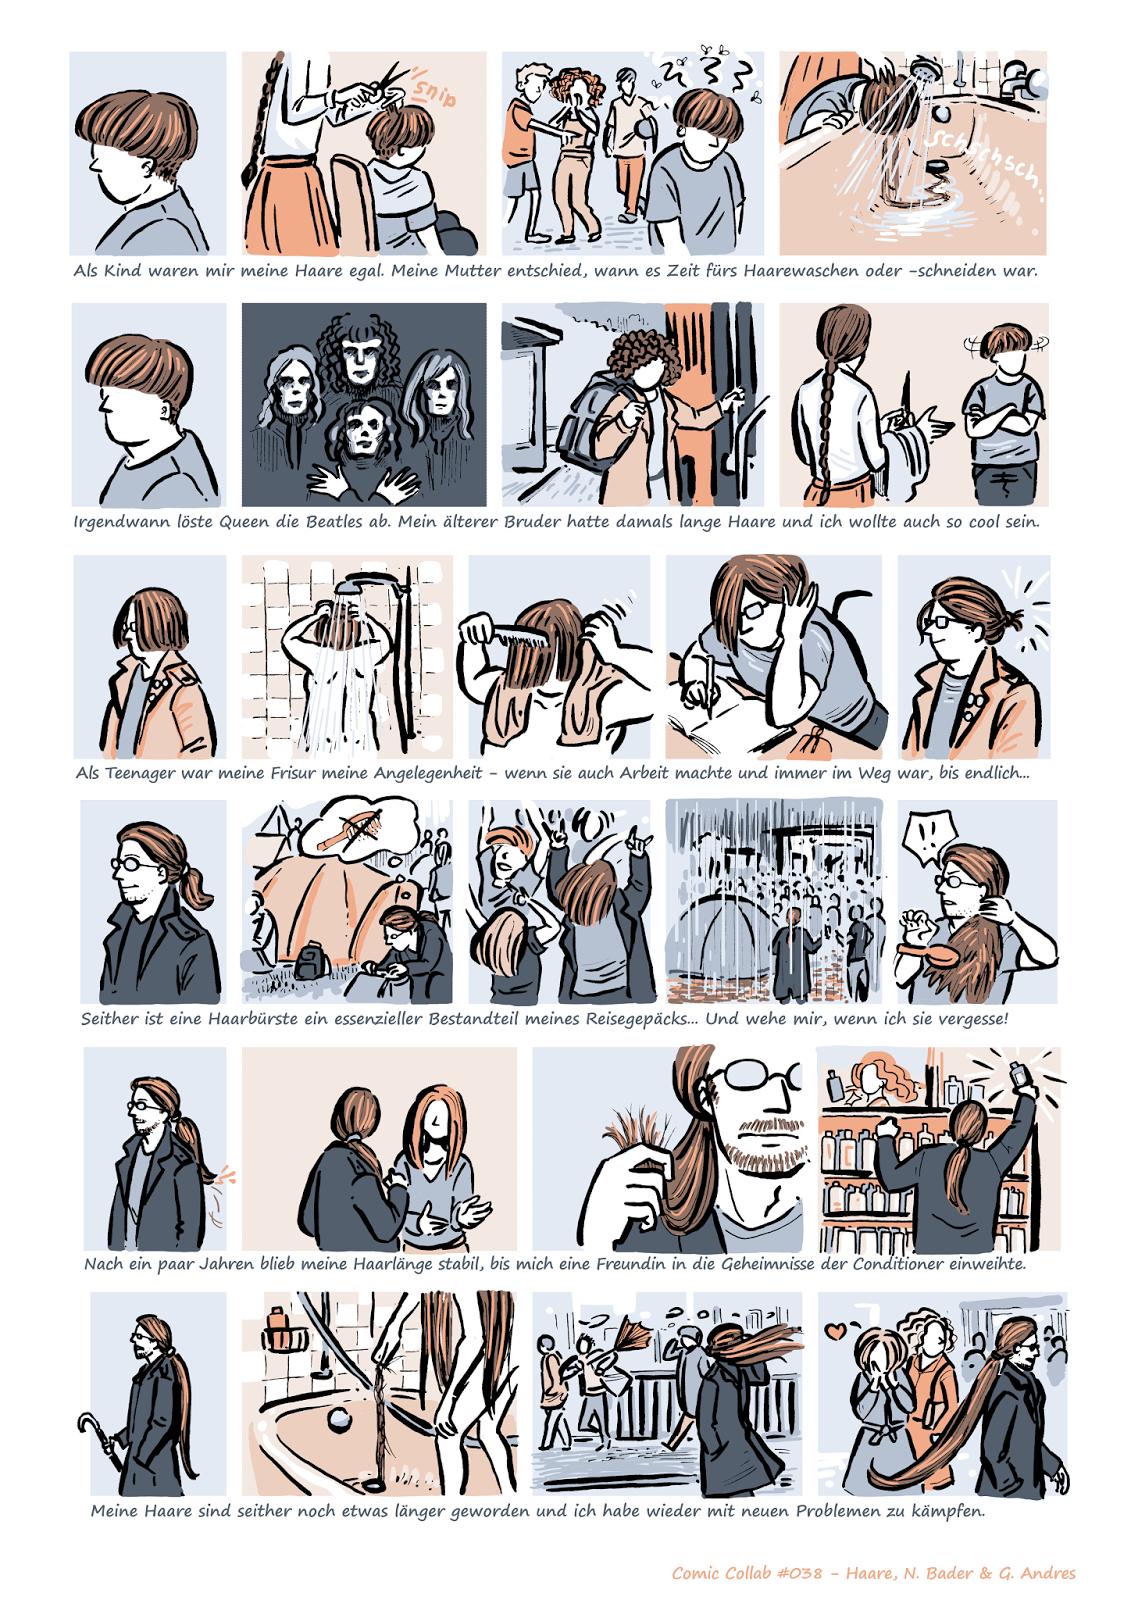 Skizzenblog Bader Comic Collab 038 Haare